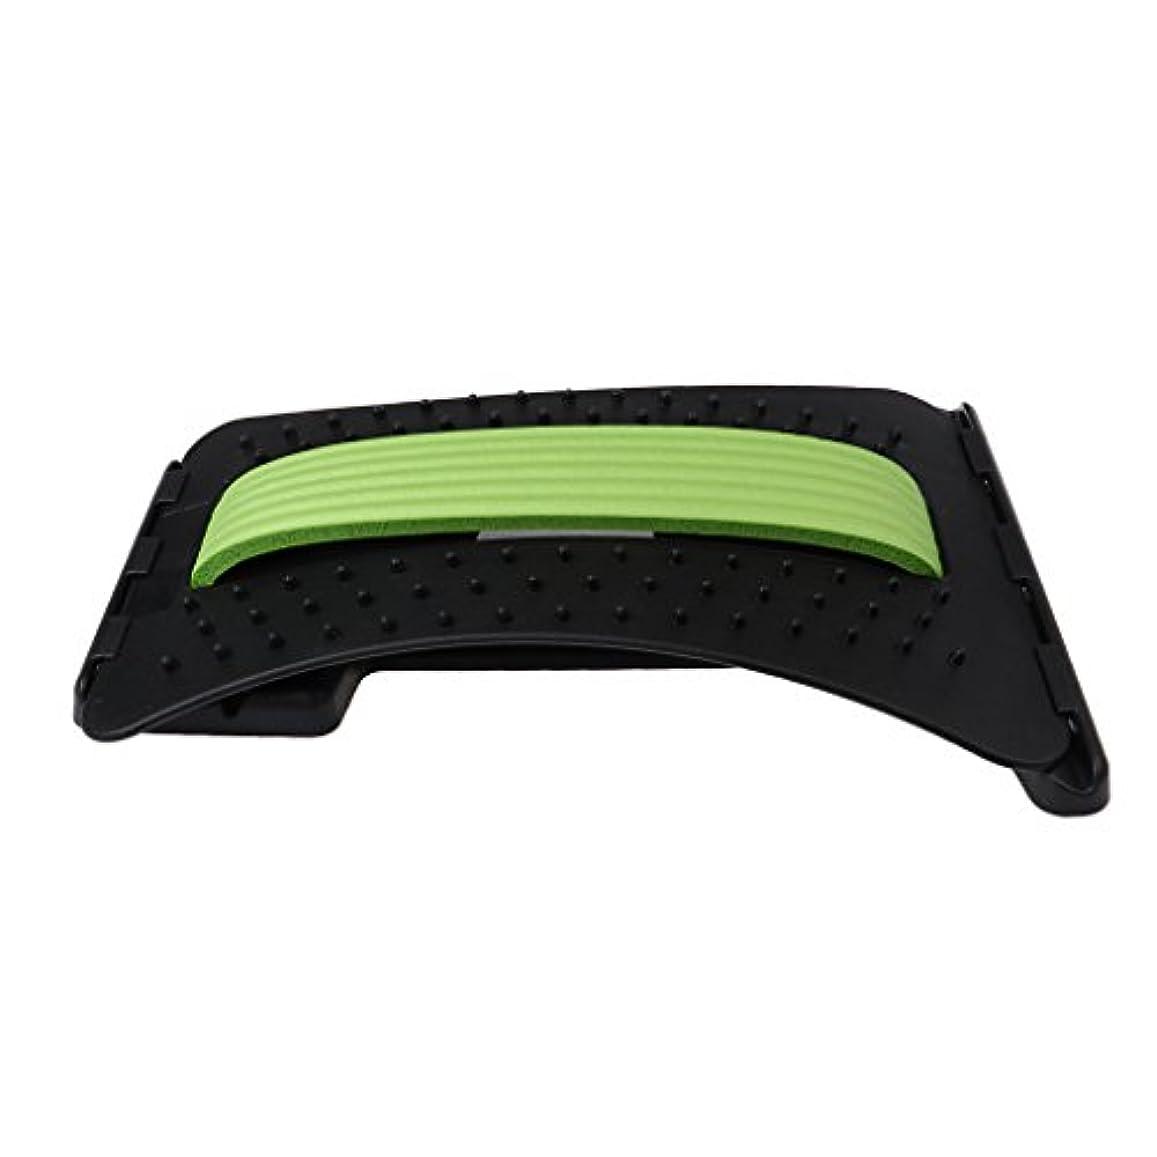 Kesoto バックストレッチャー ABS製 リラックス ストレス解消 3色選べる - 緑